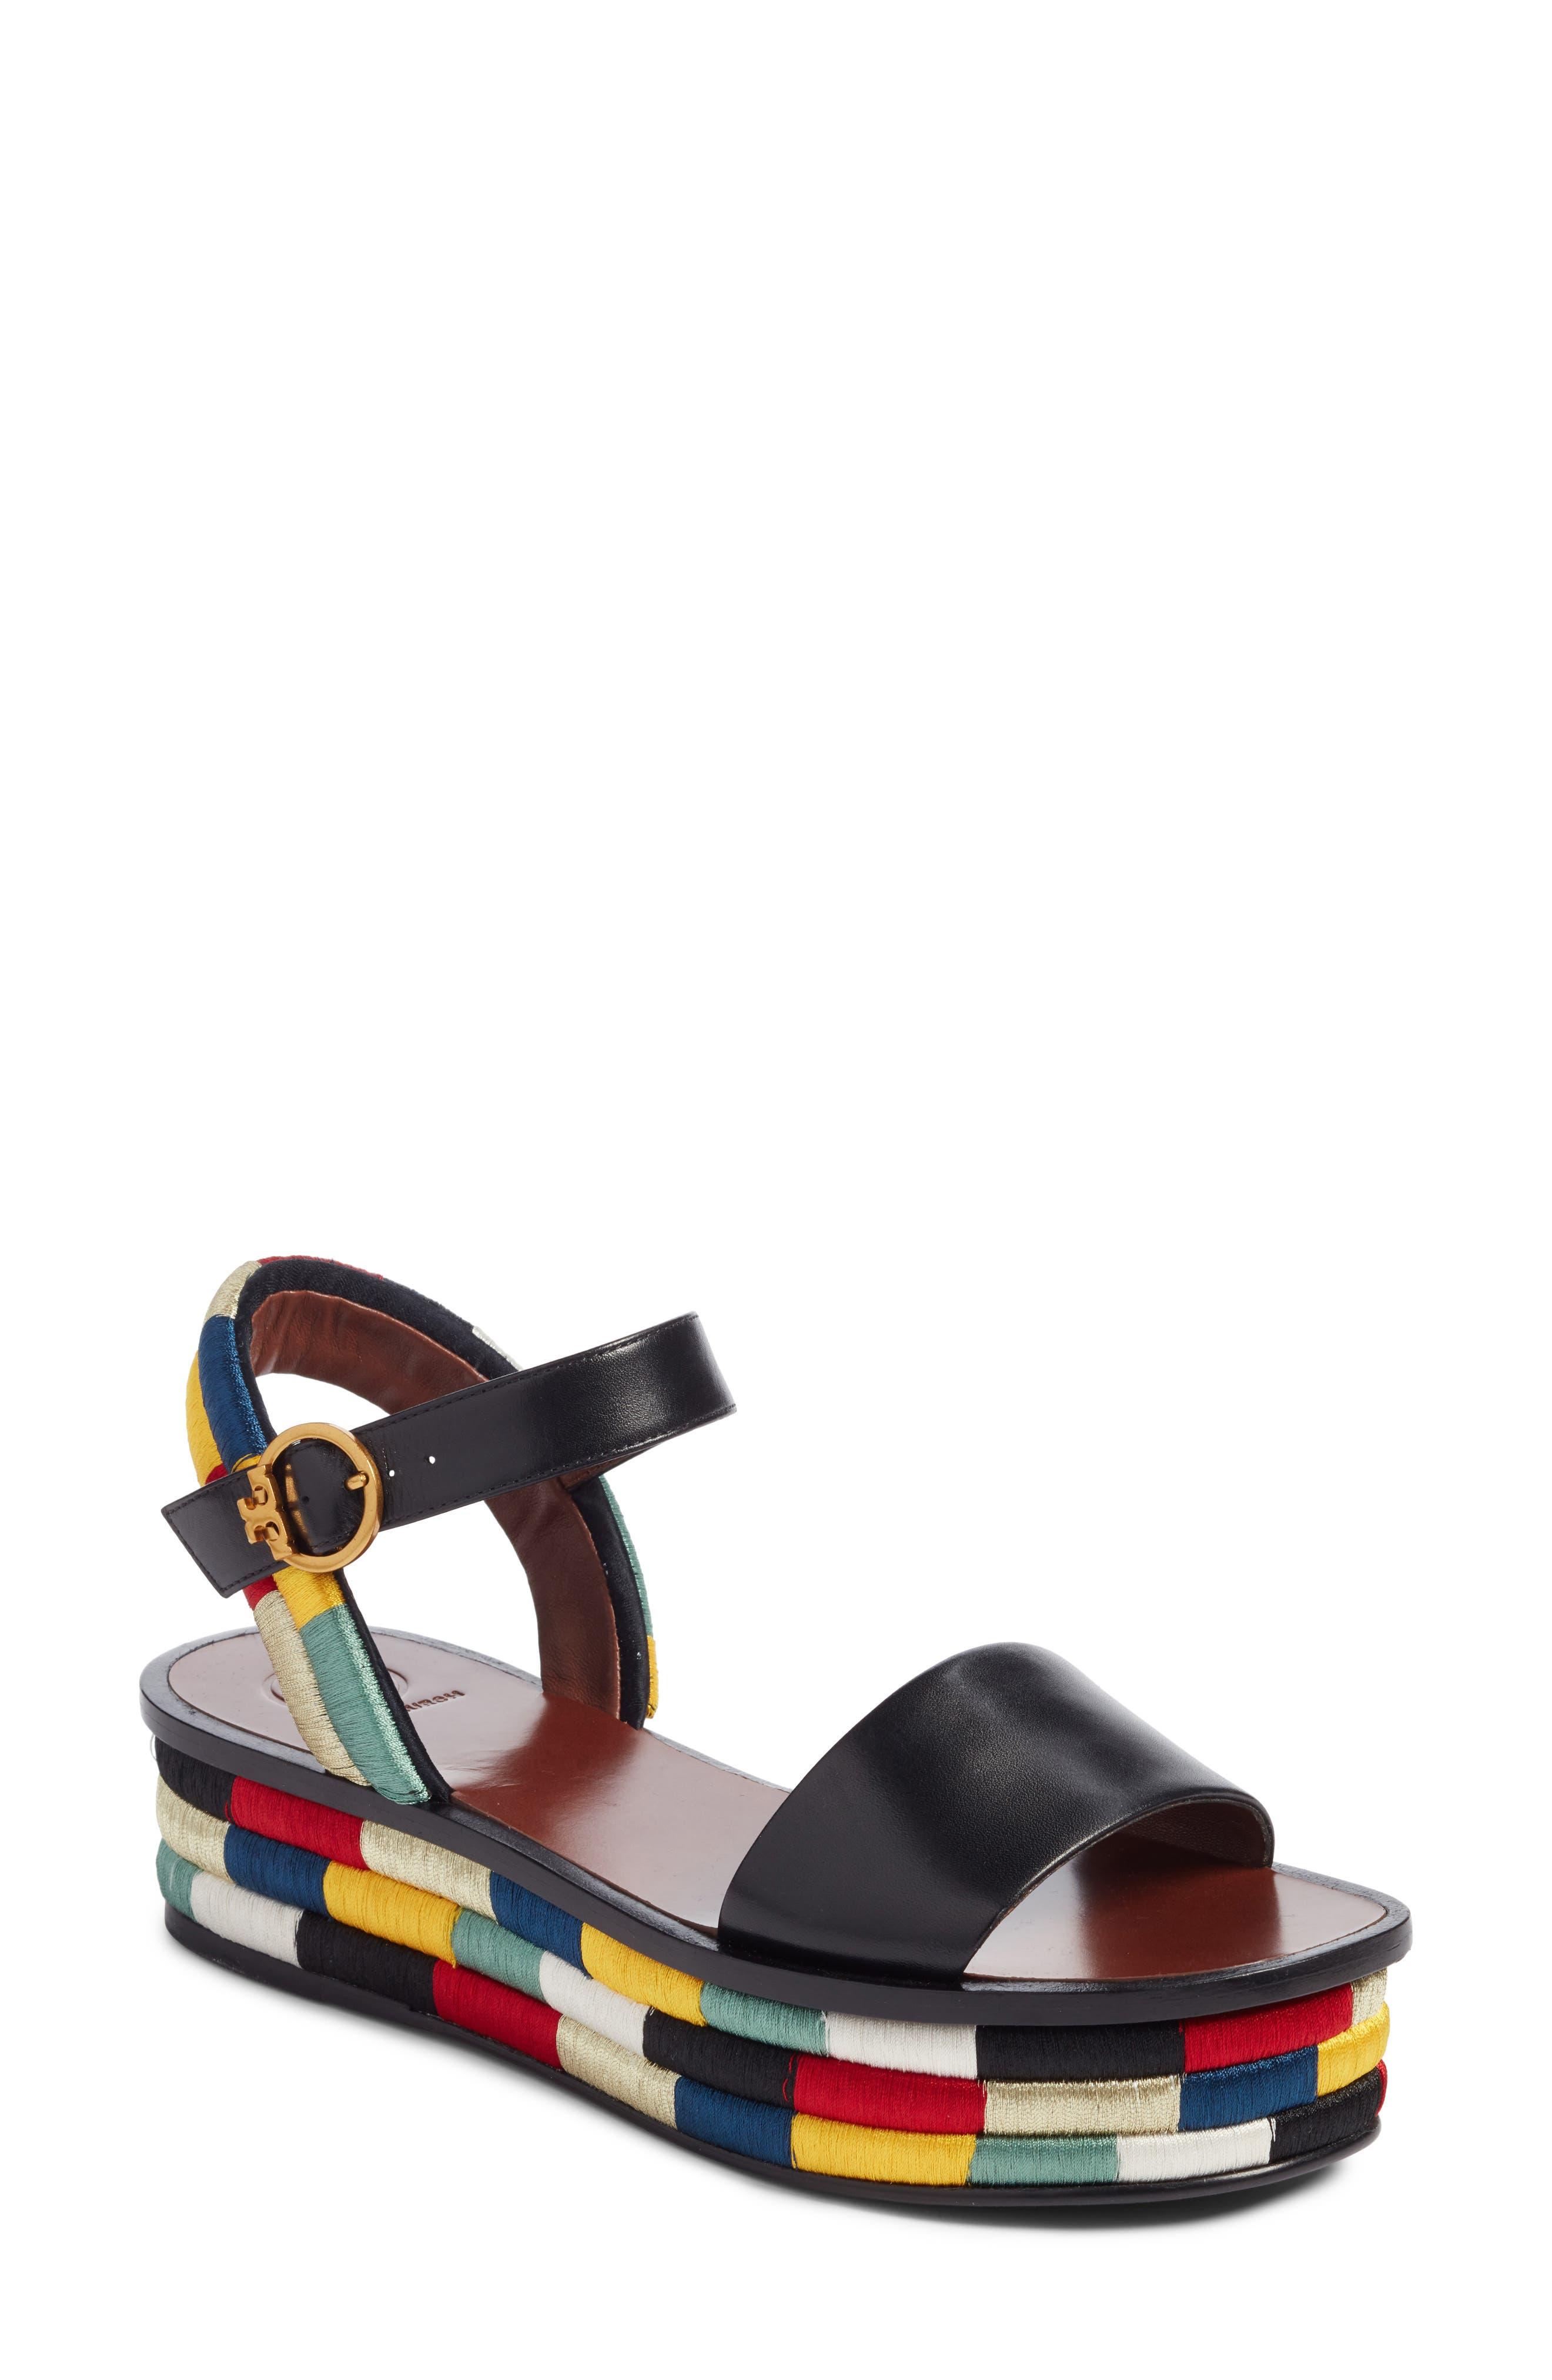 Camilla Platform Sandal,                         Main,                         color, Black